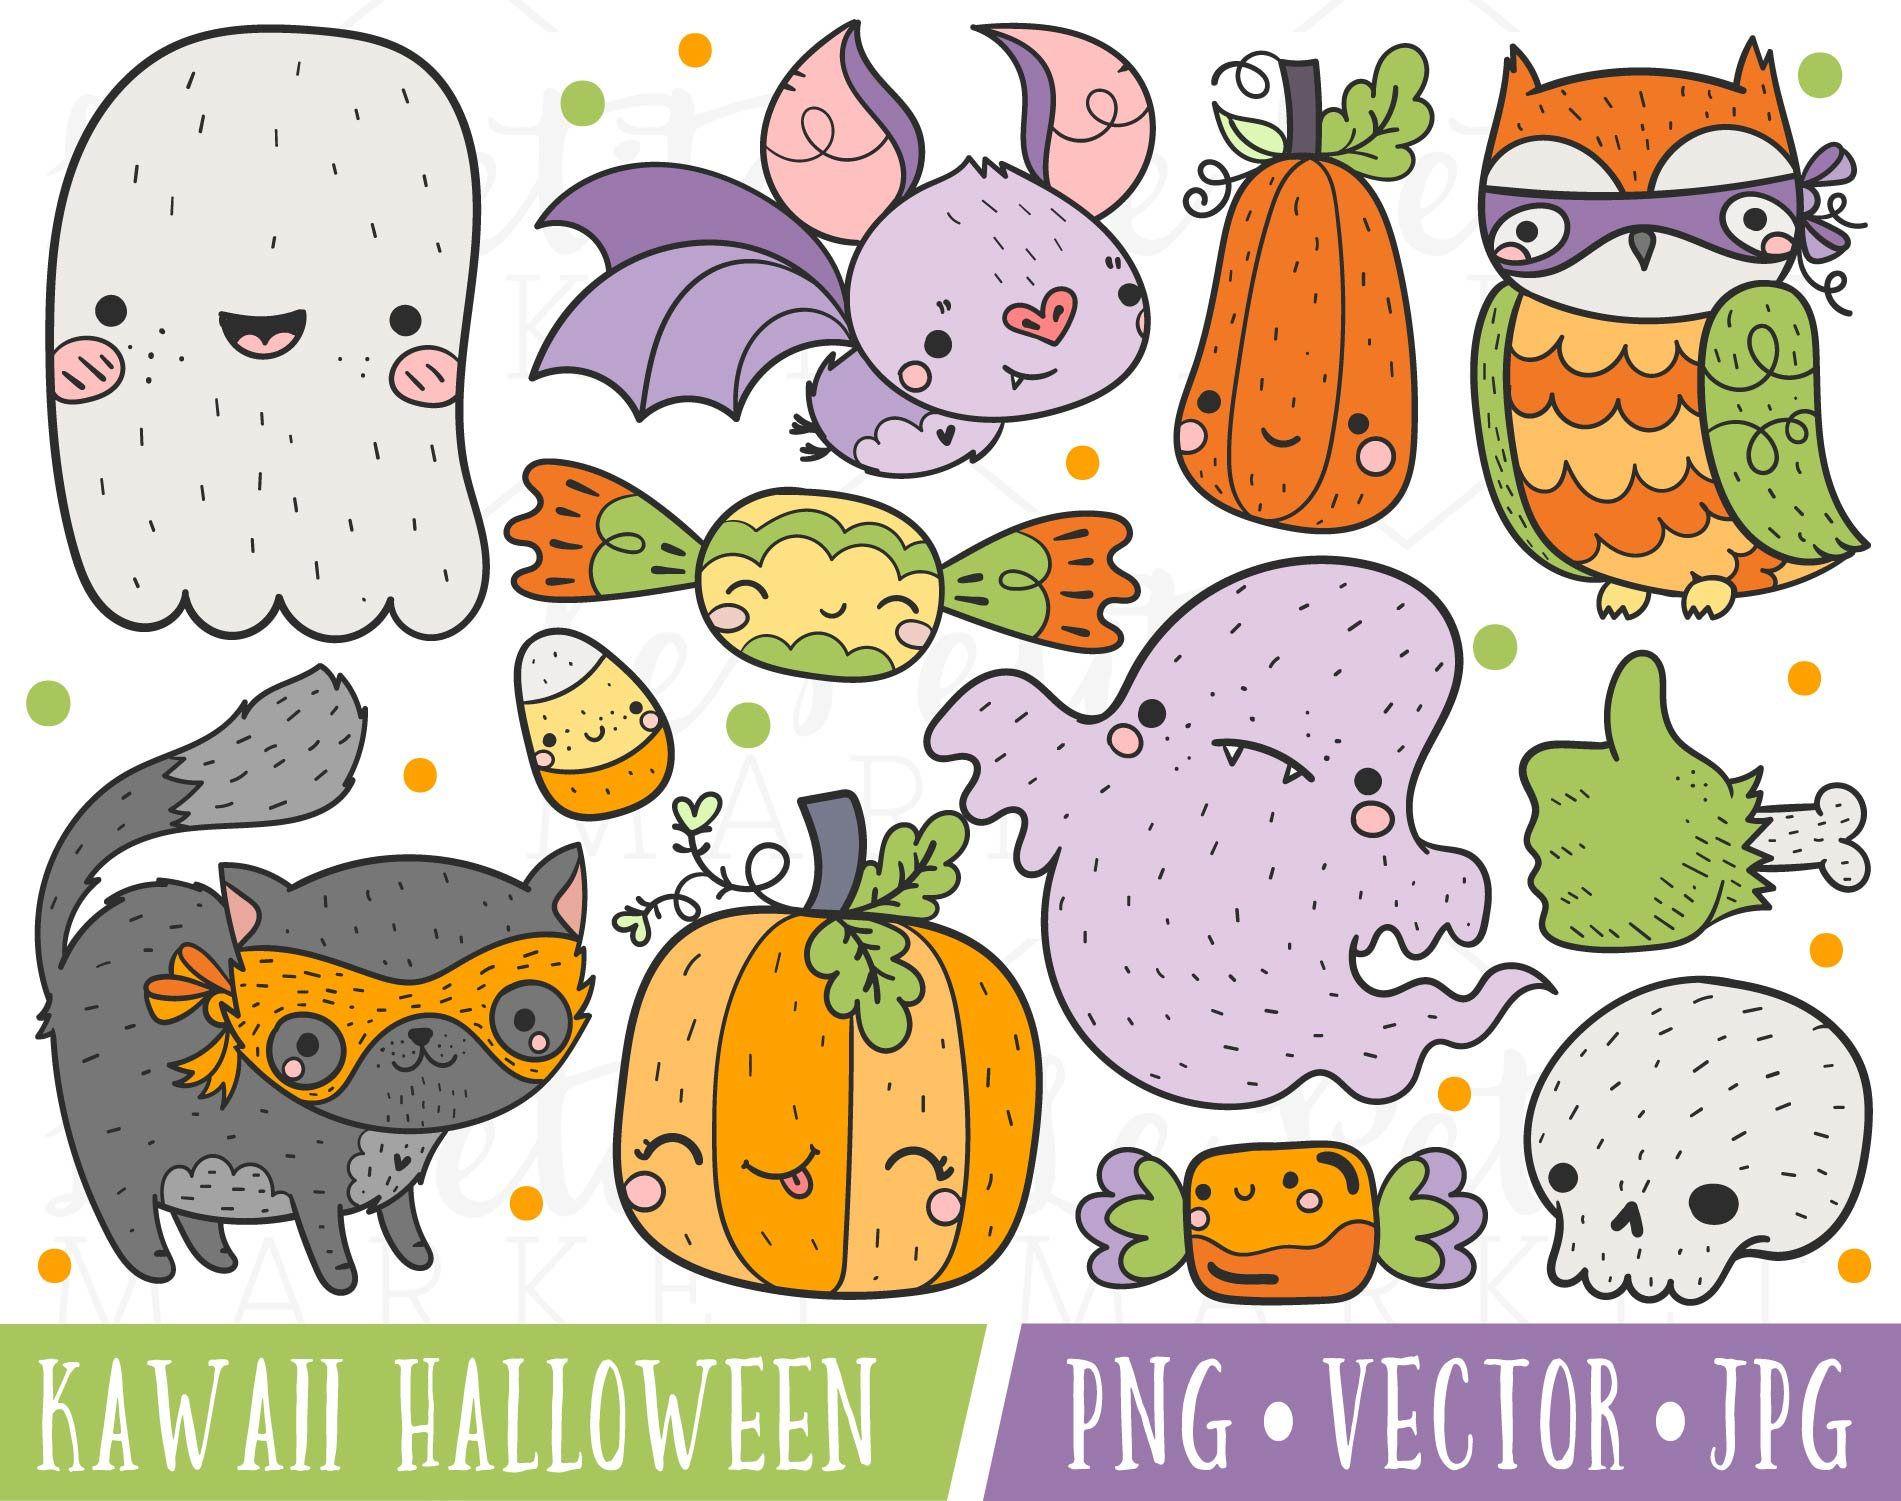 Cute Halloween Clipart Images Cute Bat Clipart Cute Etsy Halloween Clipart Halloween Clips Kawaii Clipart